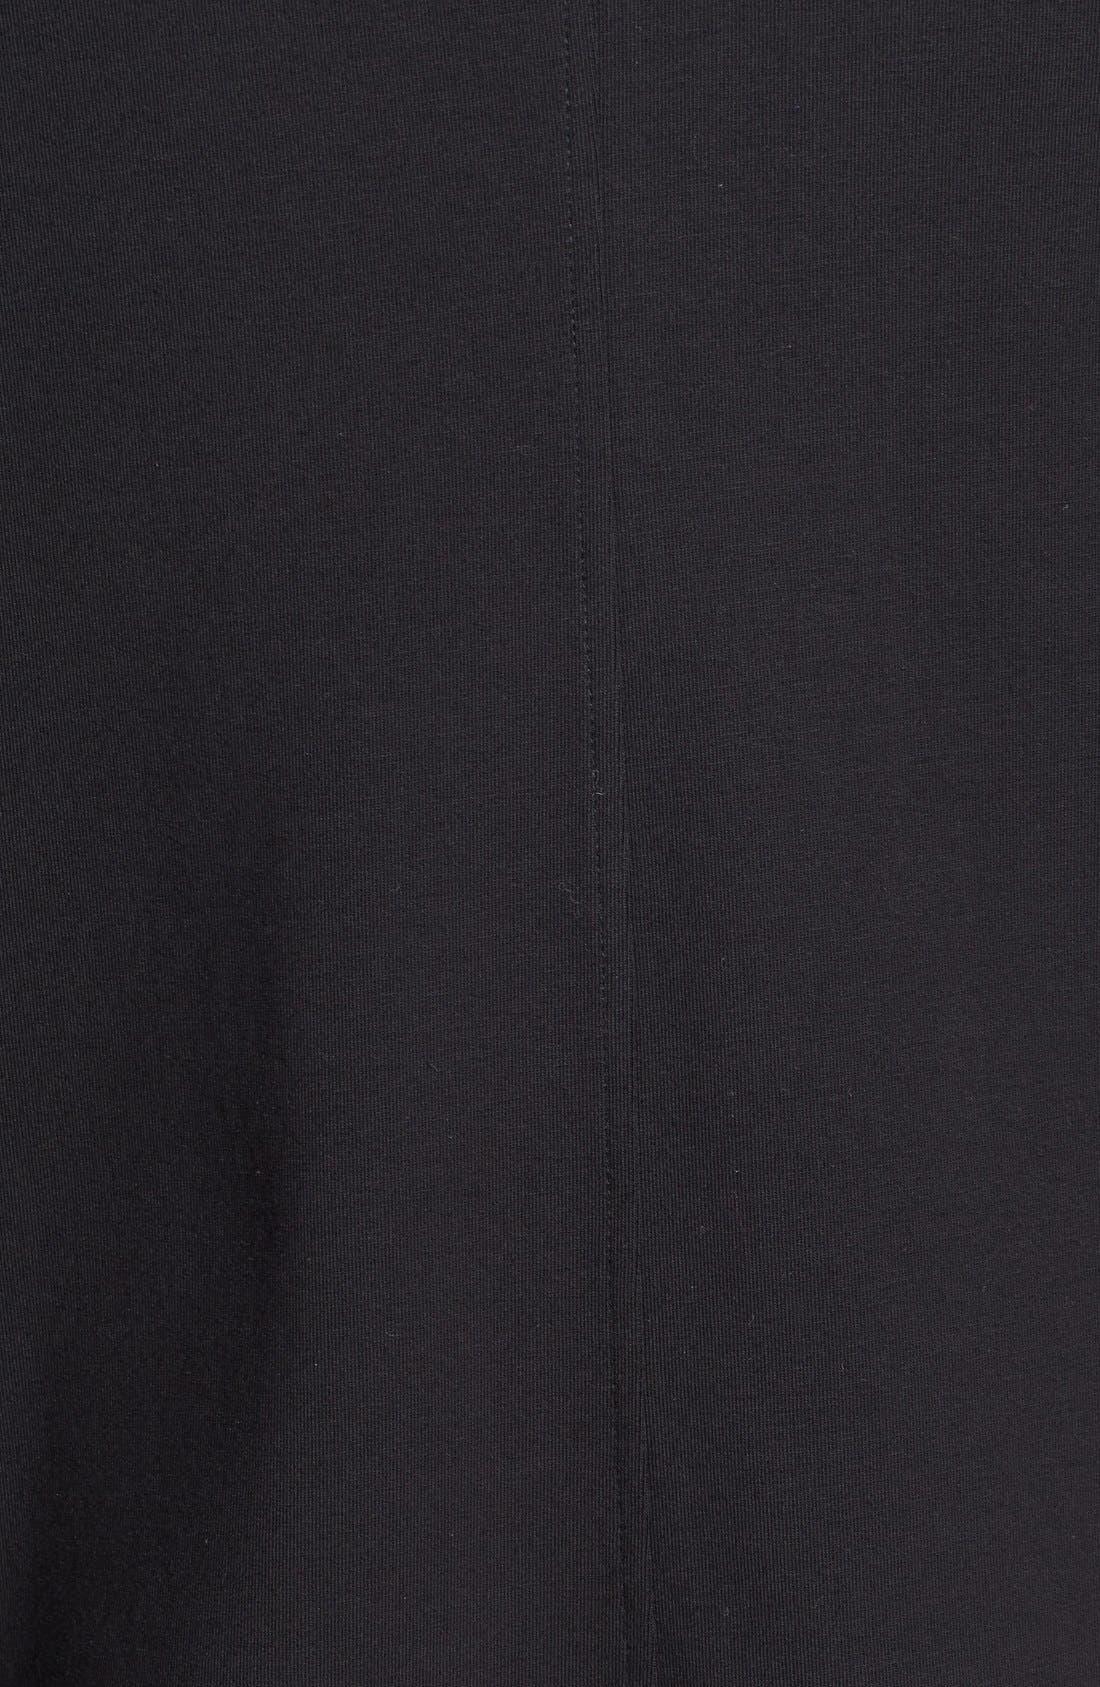 Alternate Image 3  - Eileen Fisher Organic Cotton Blend Jacket (Plus Size)